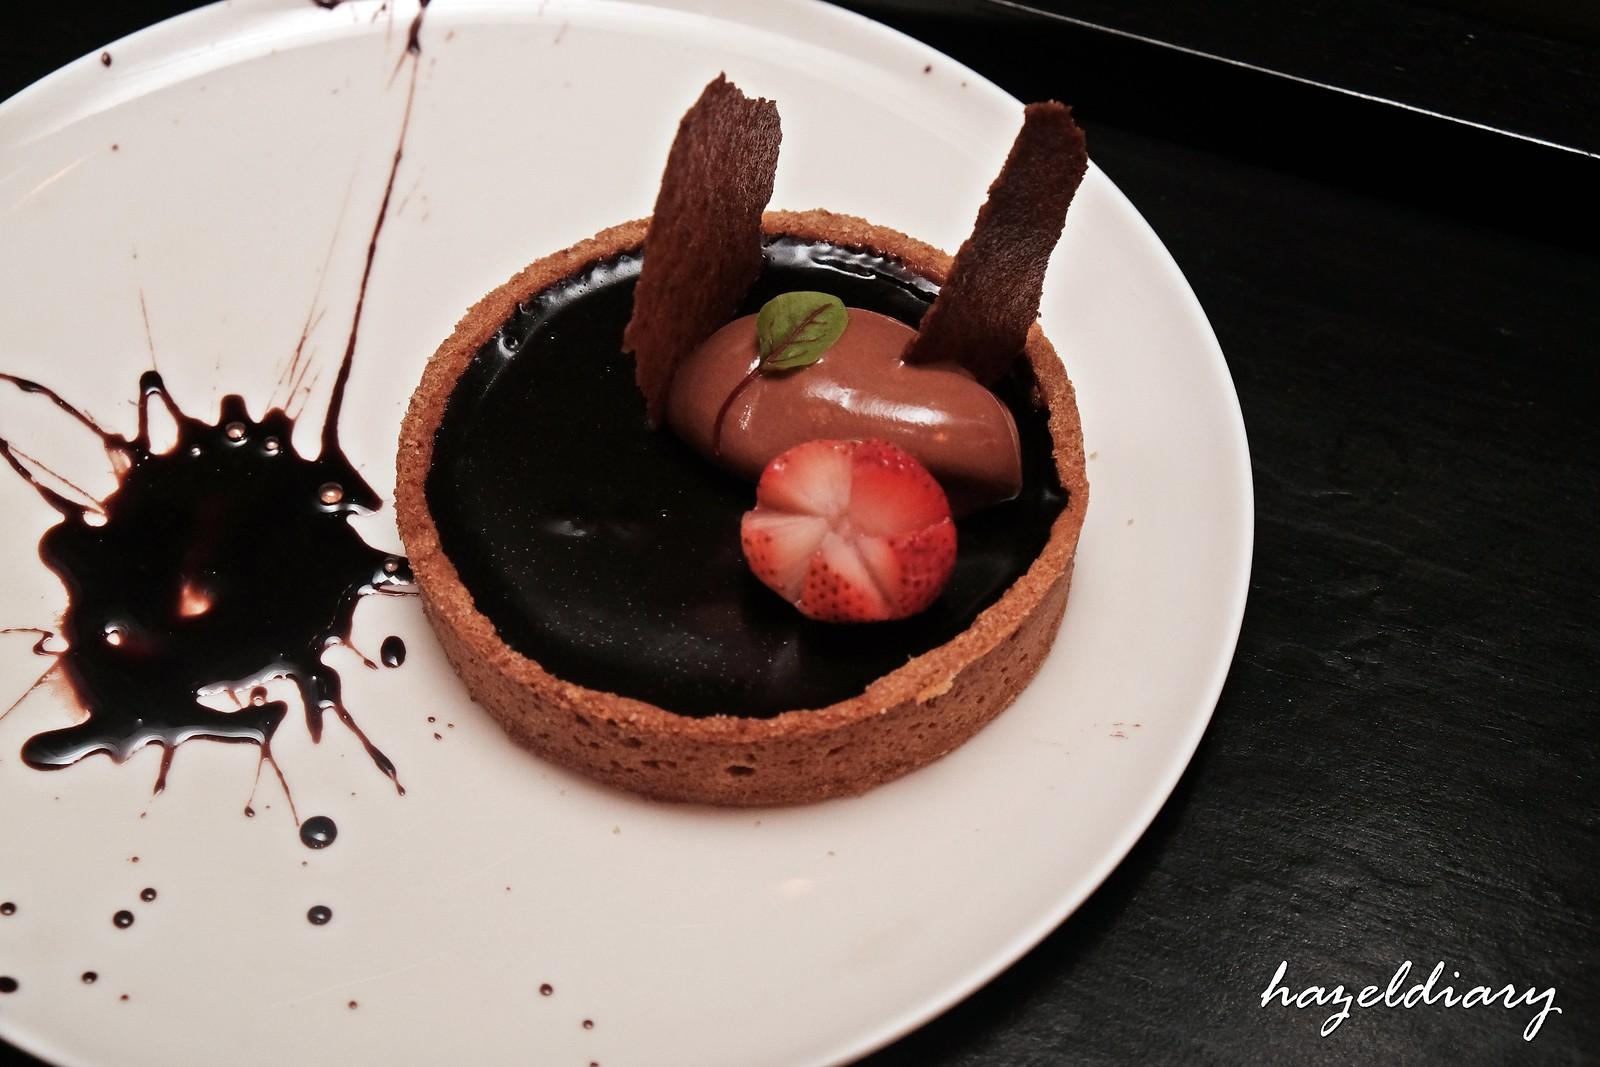 LeVeL 33 - Dessert Chocolate Tart